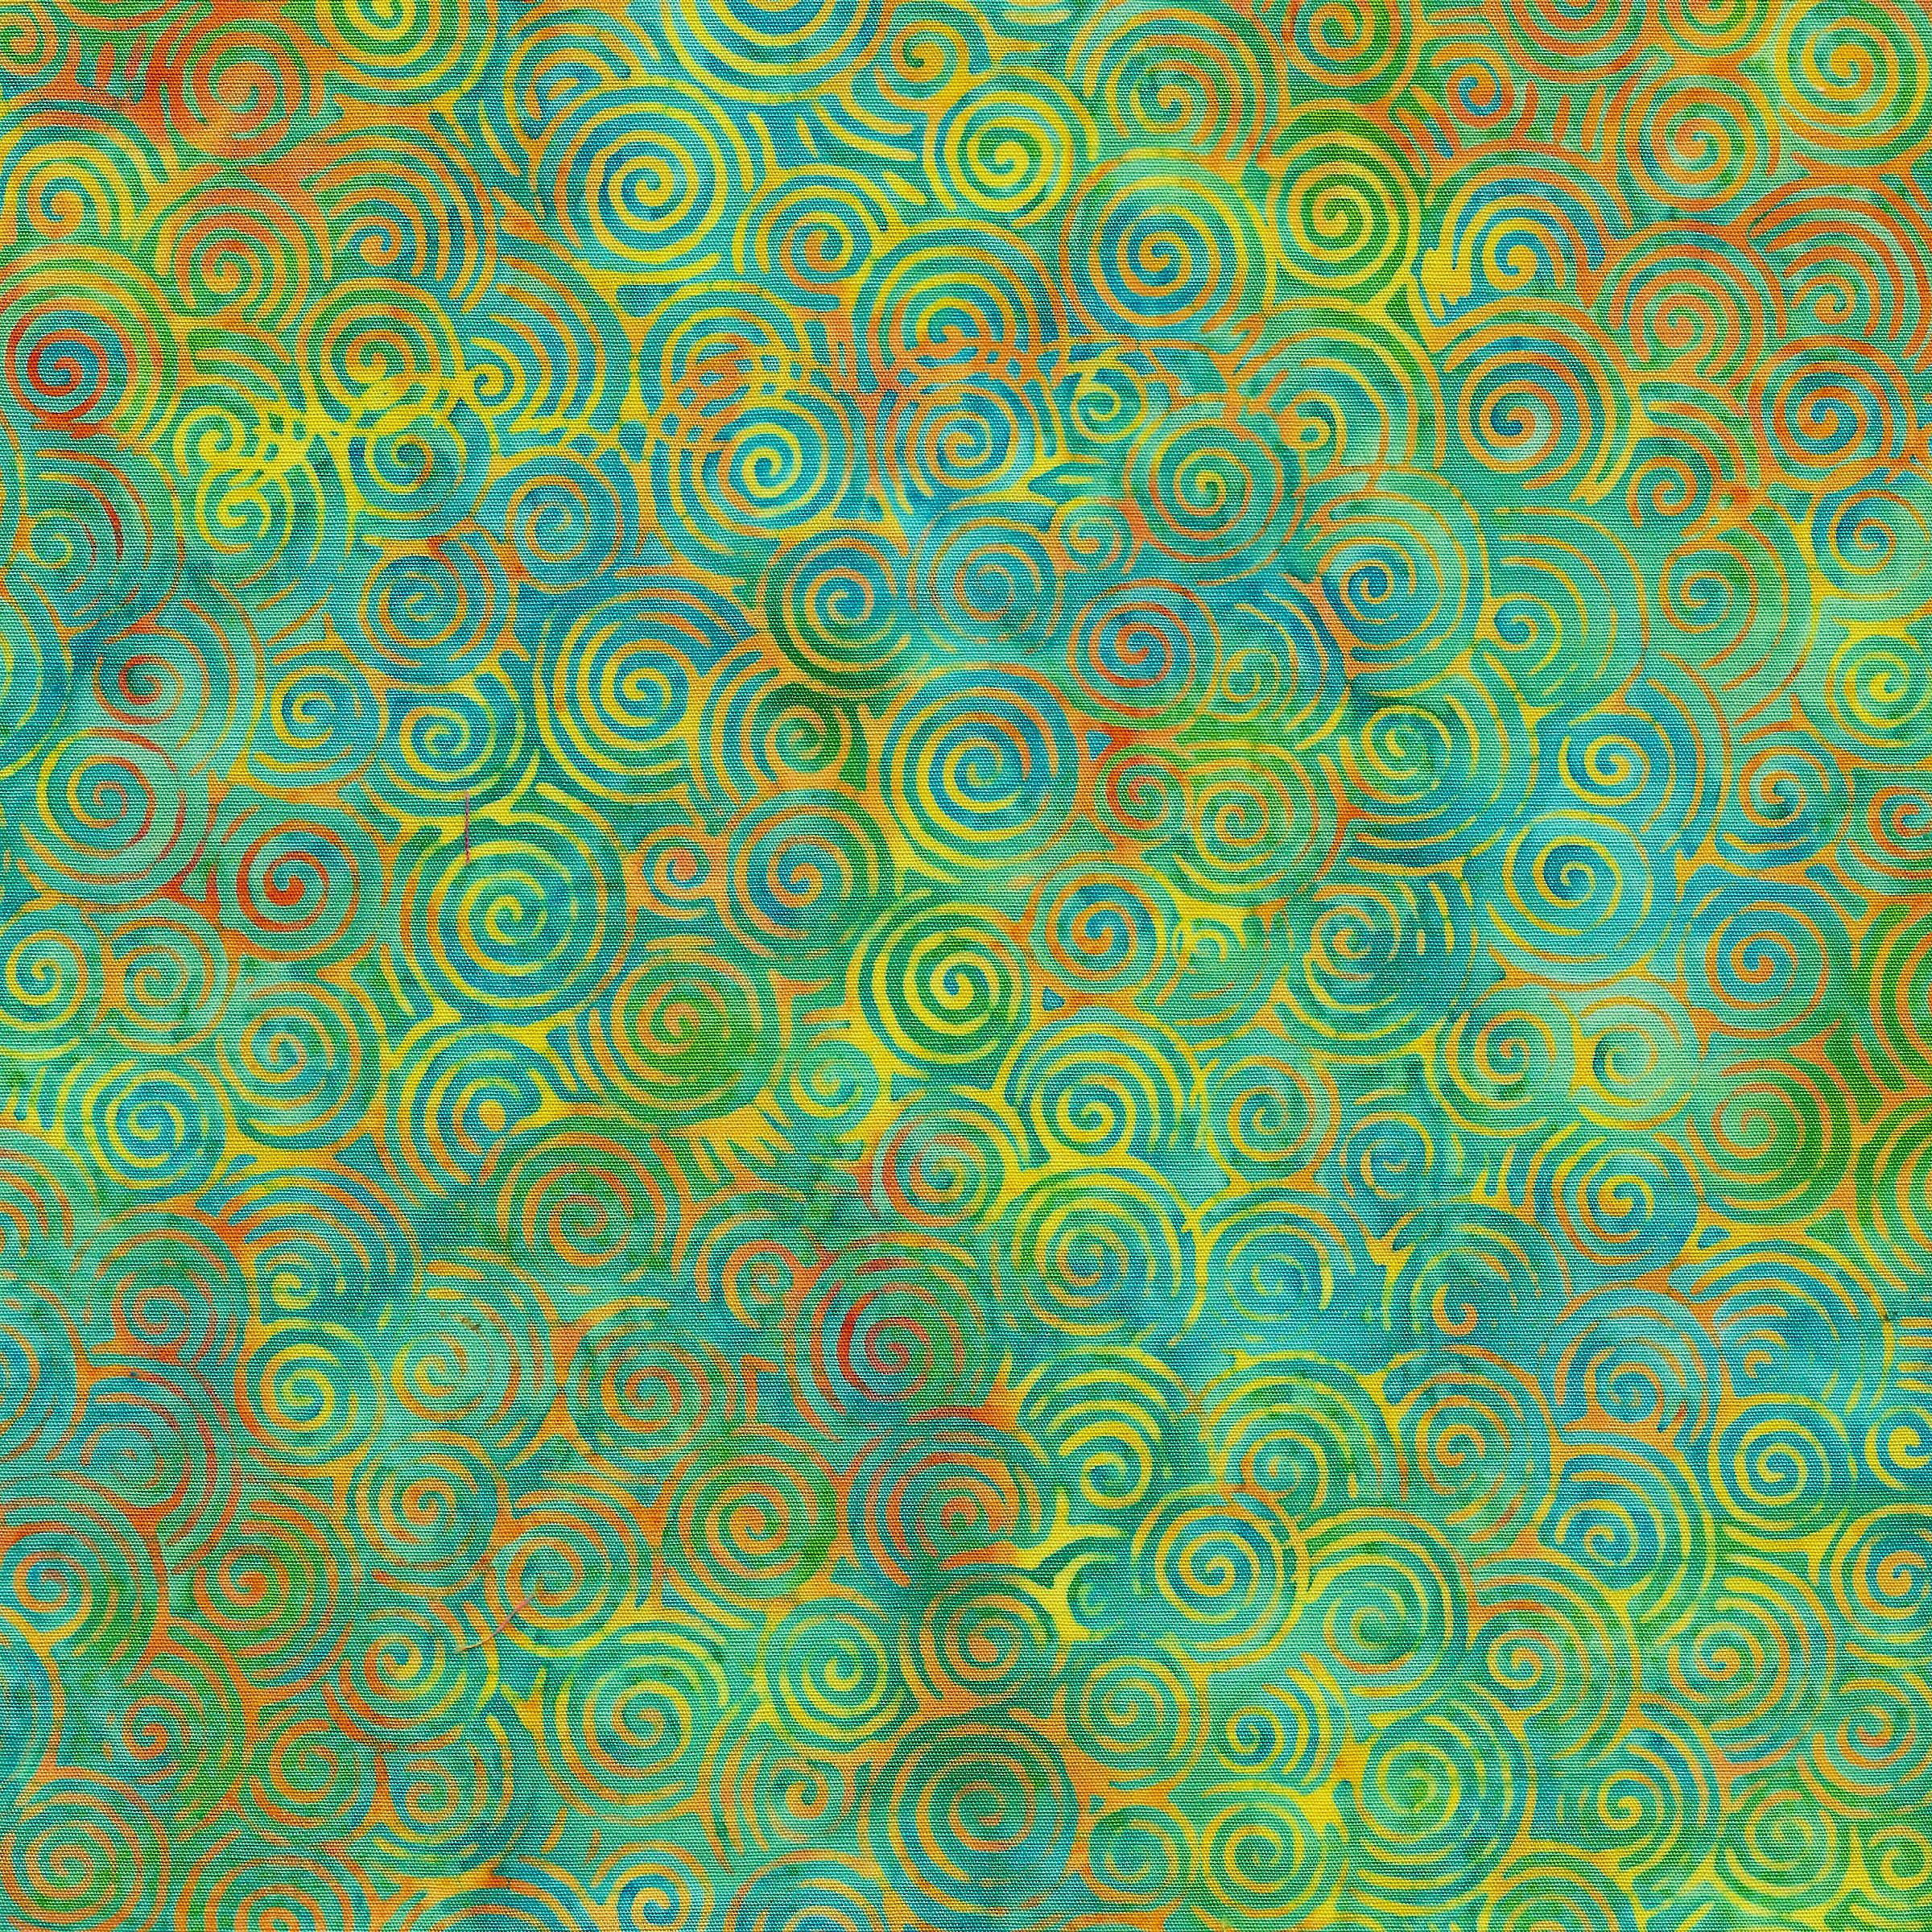 111908215 / Swirl -Candy Corn